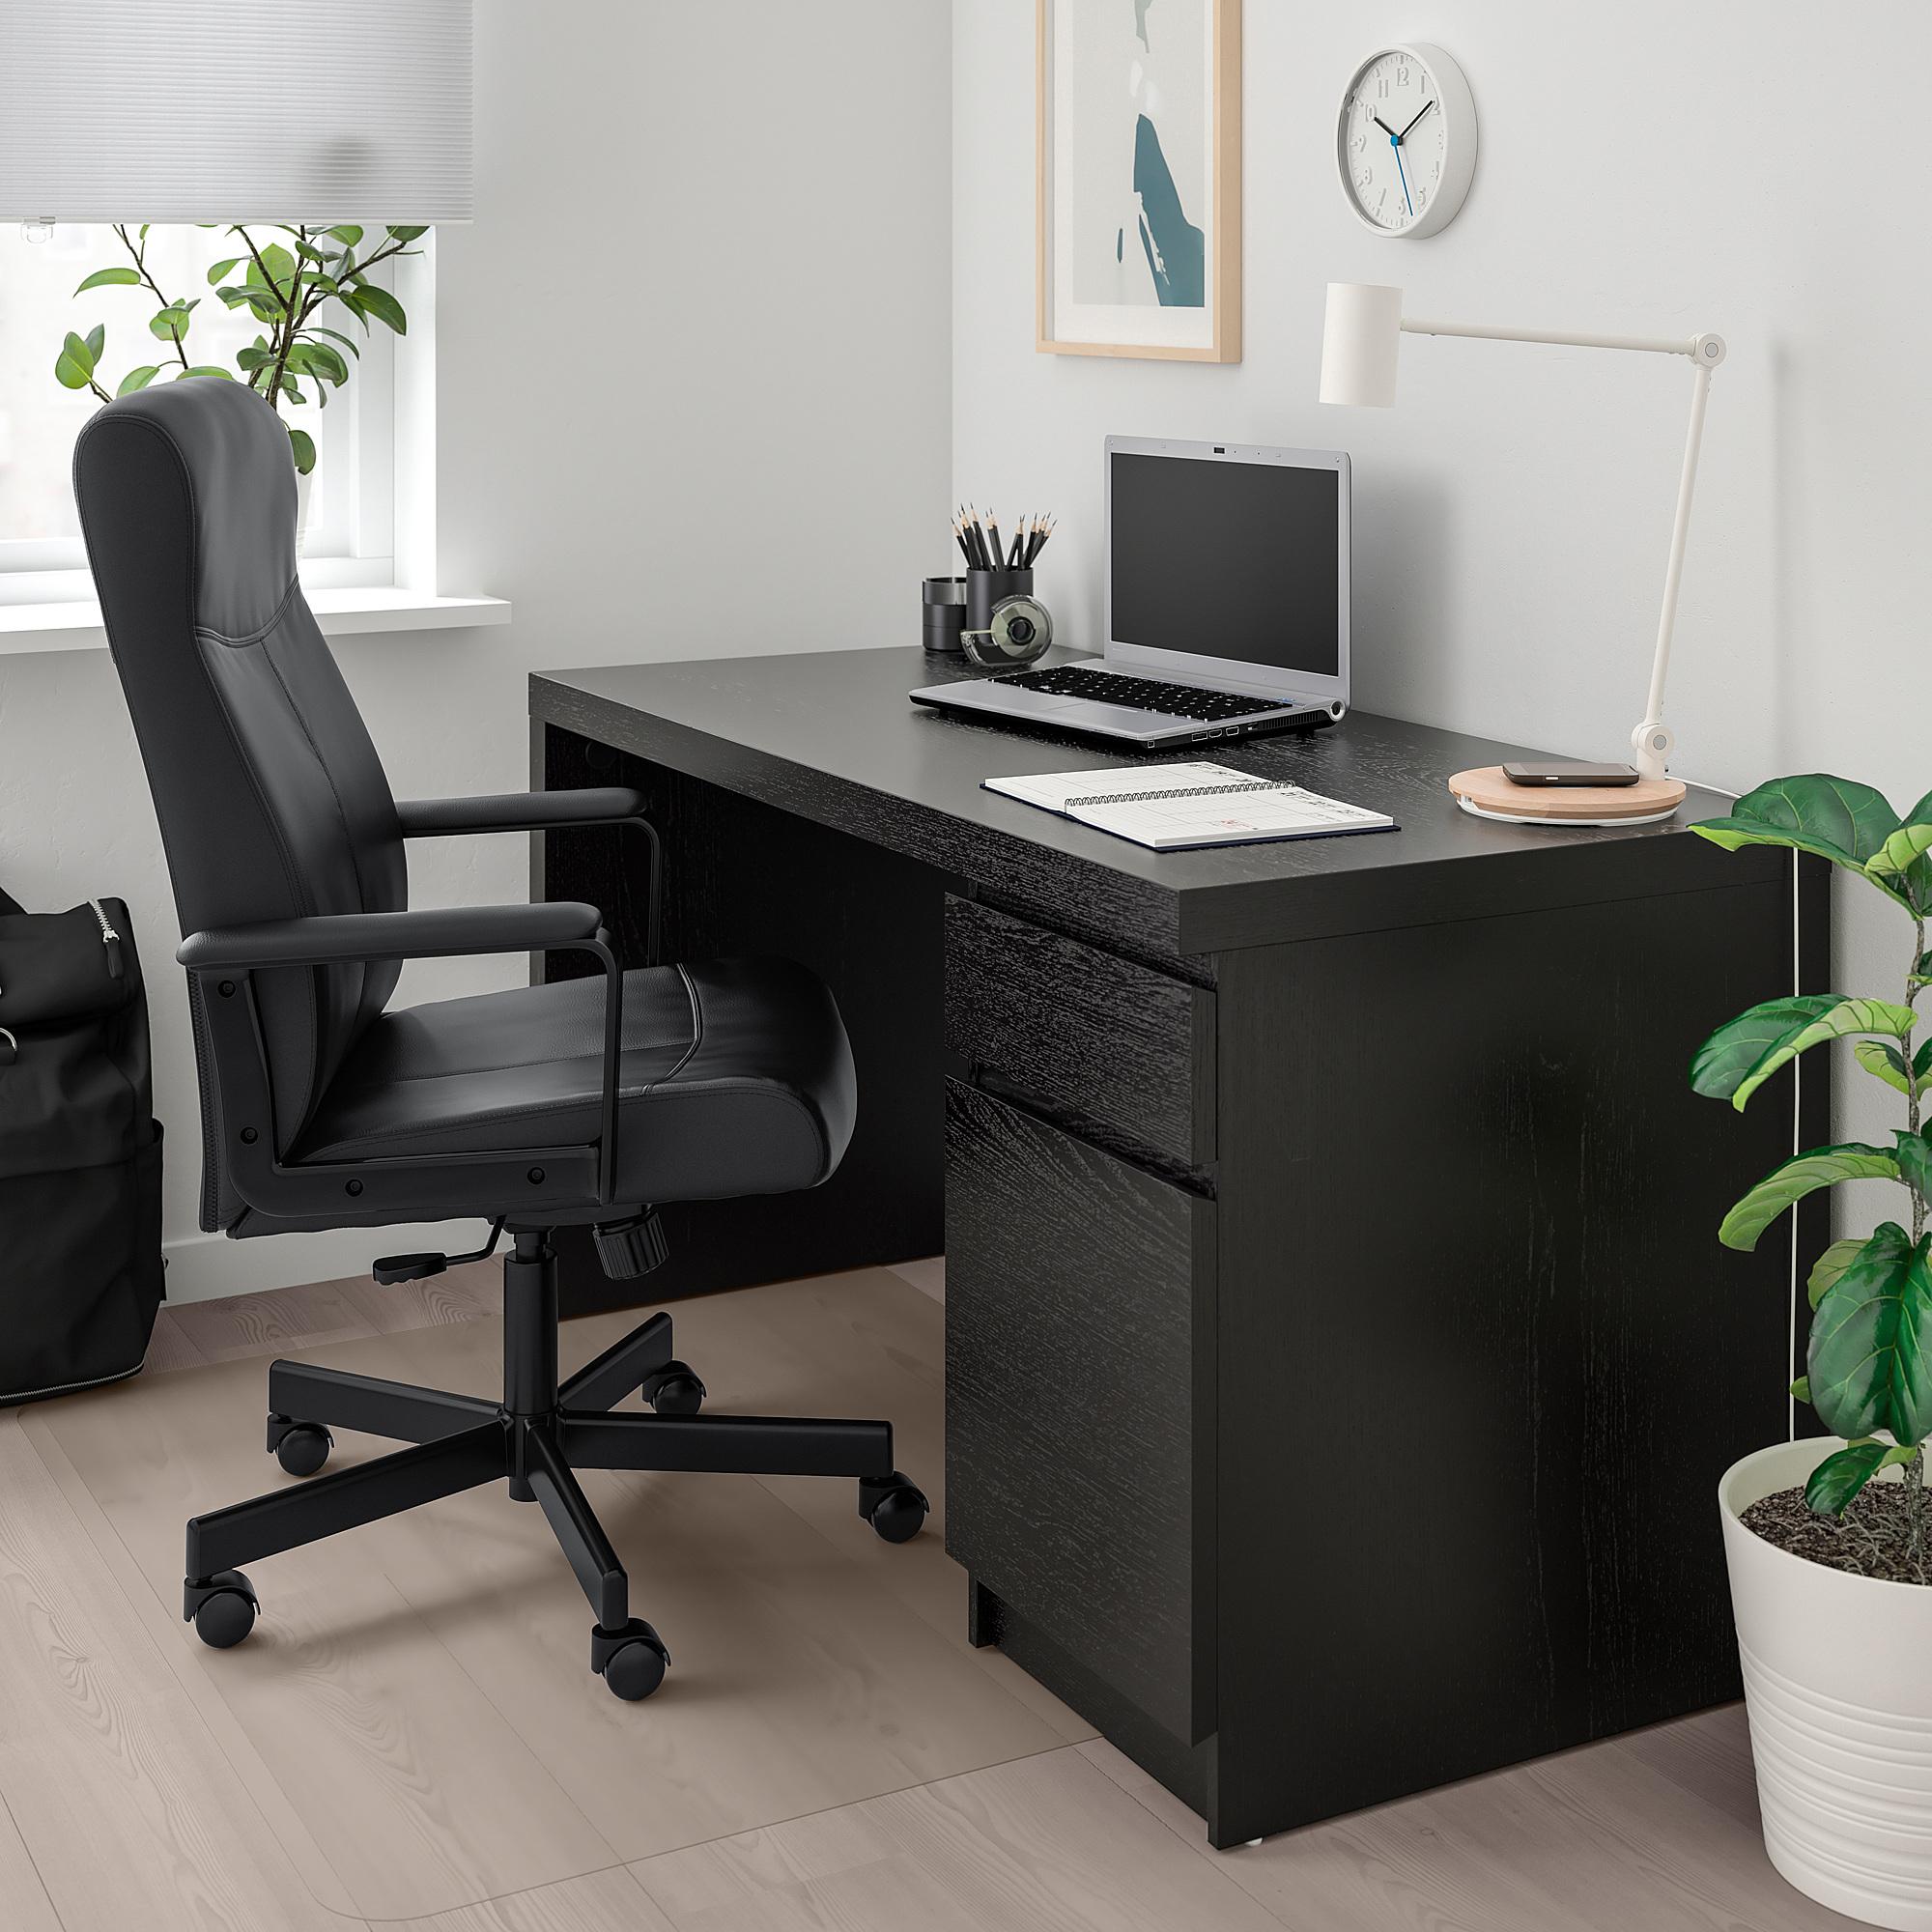 Millberget Swivel Chair Bomstad Black Ikea Indonesia